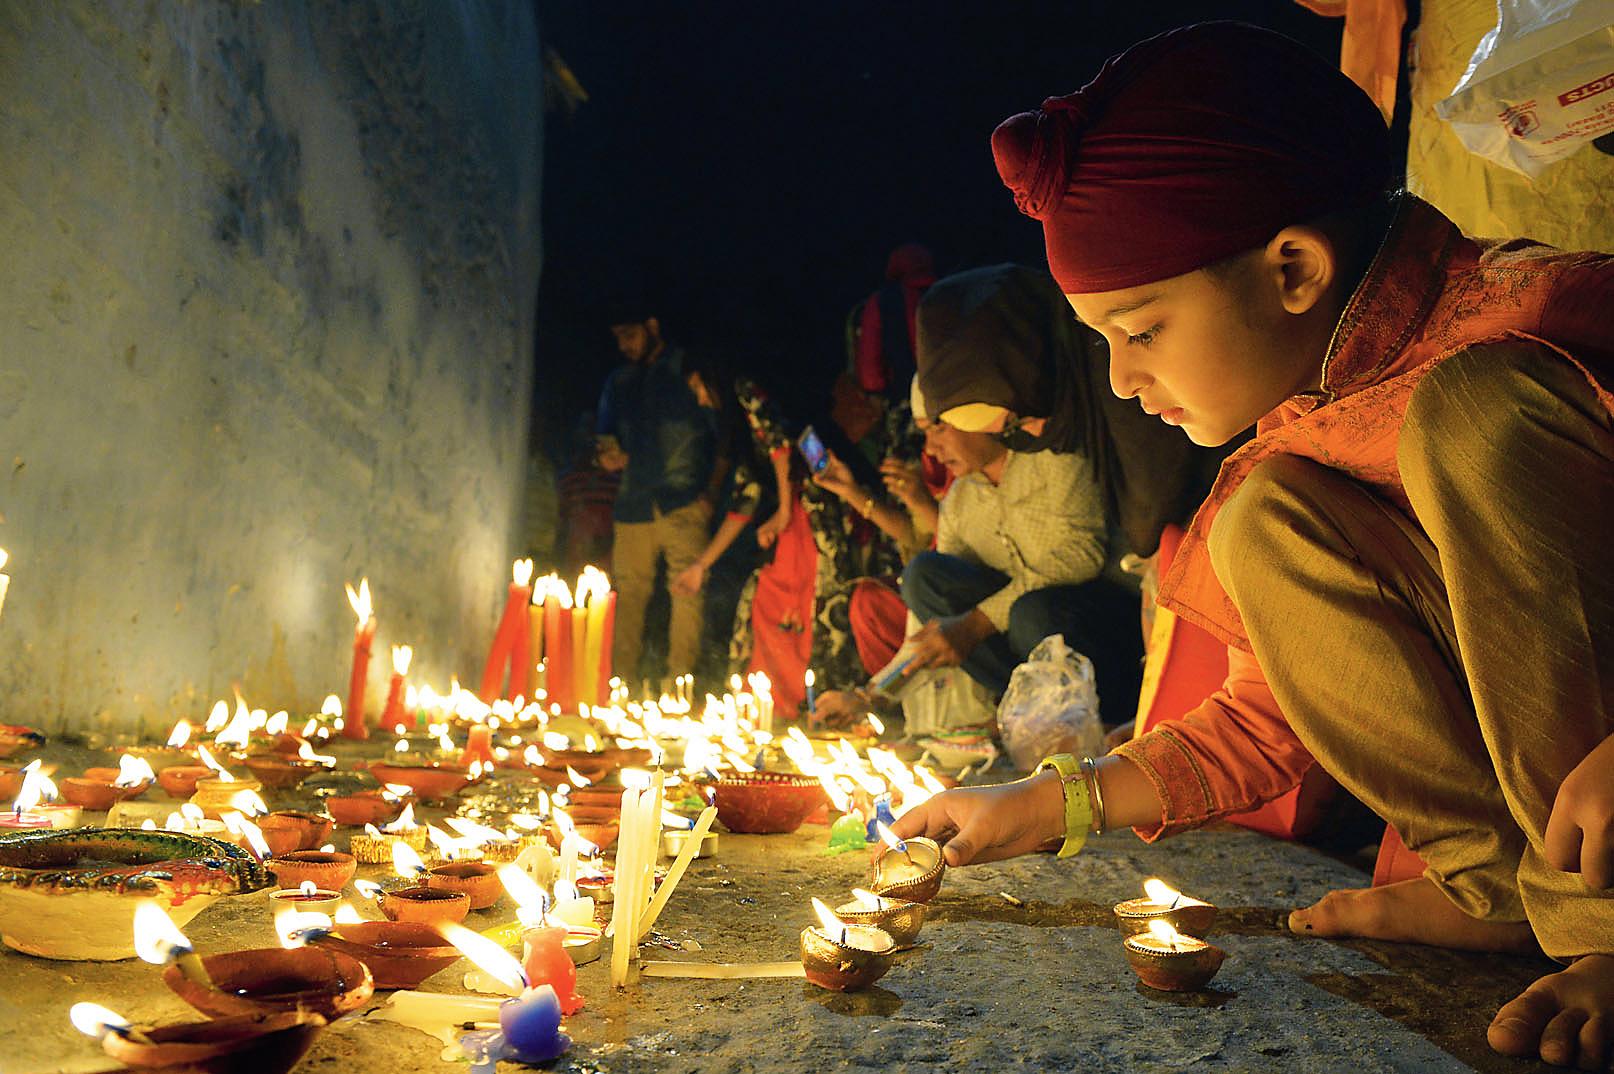 Lamps and candles being lit at Behala Gurdwara on the night of Bandi Chhor Divas.